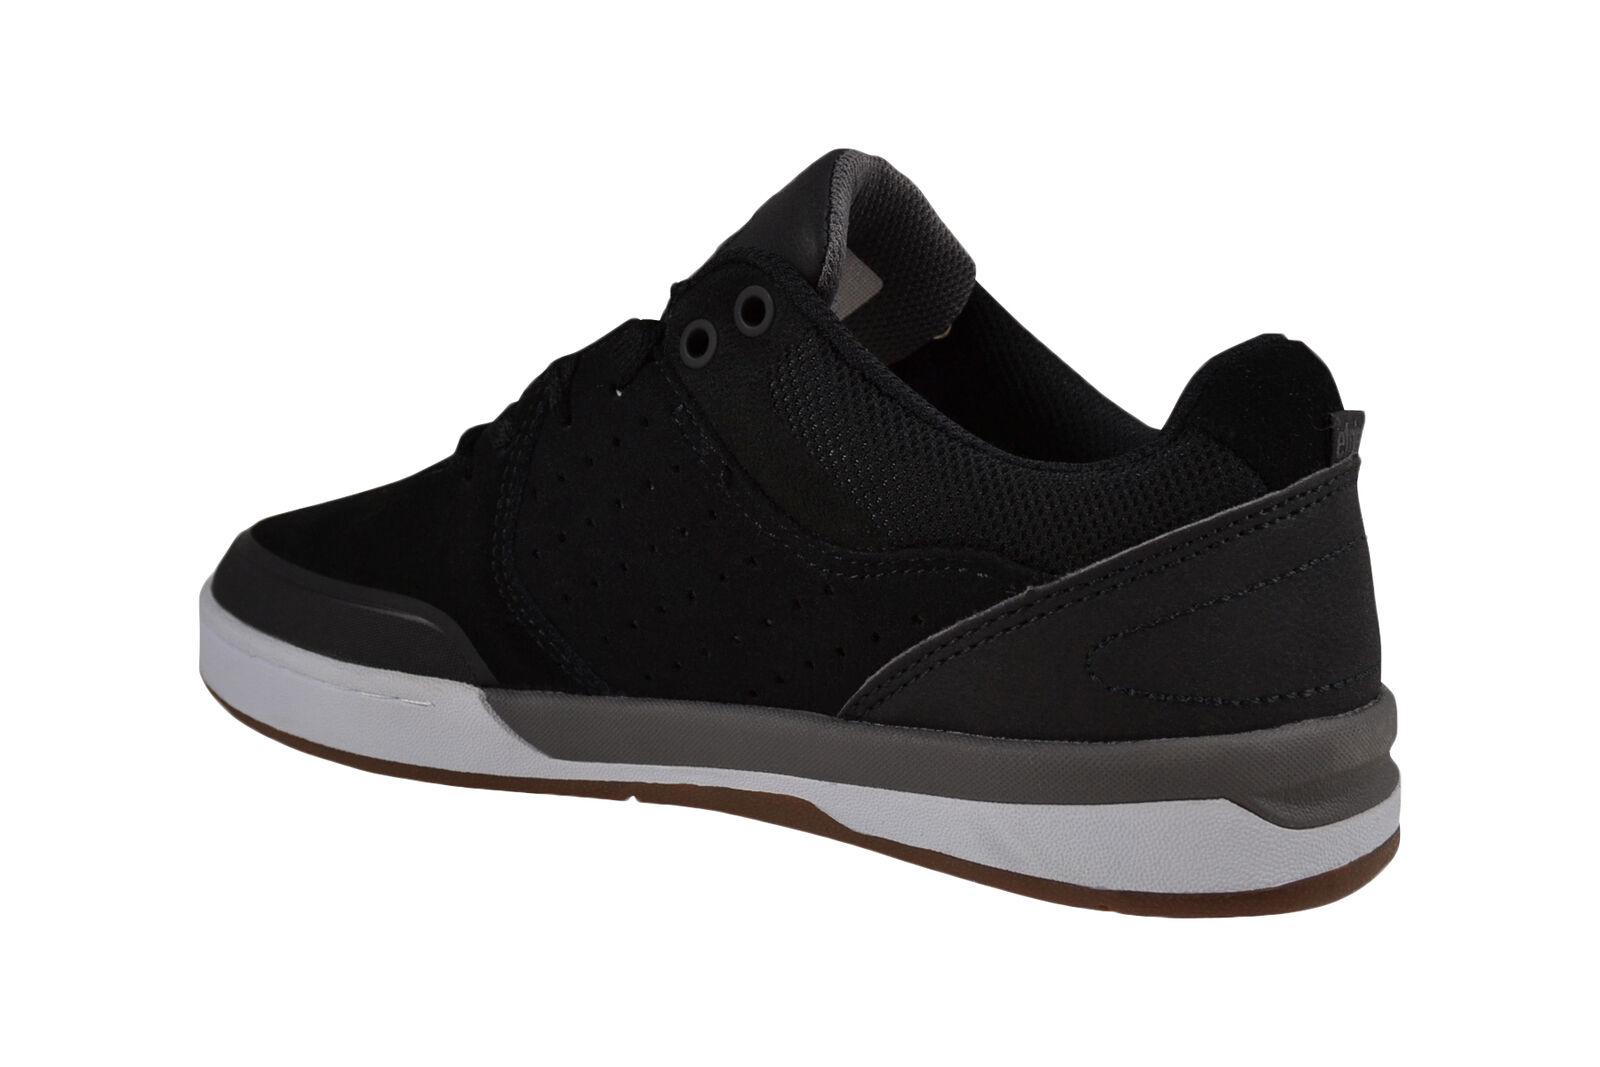 Etnies Marana xt Black Black xt skater Baskets/Chaussures Noir 0ac339